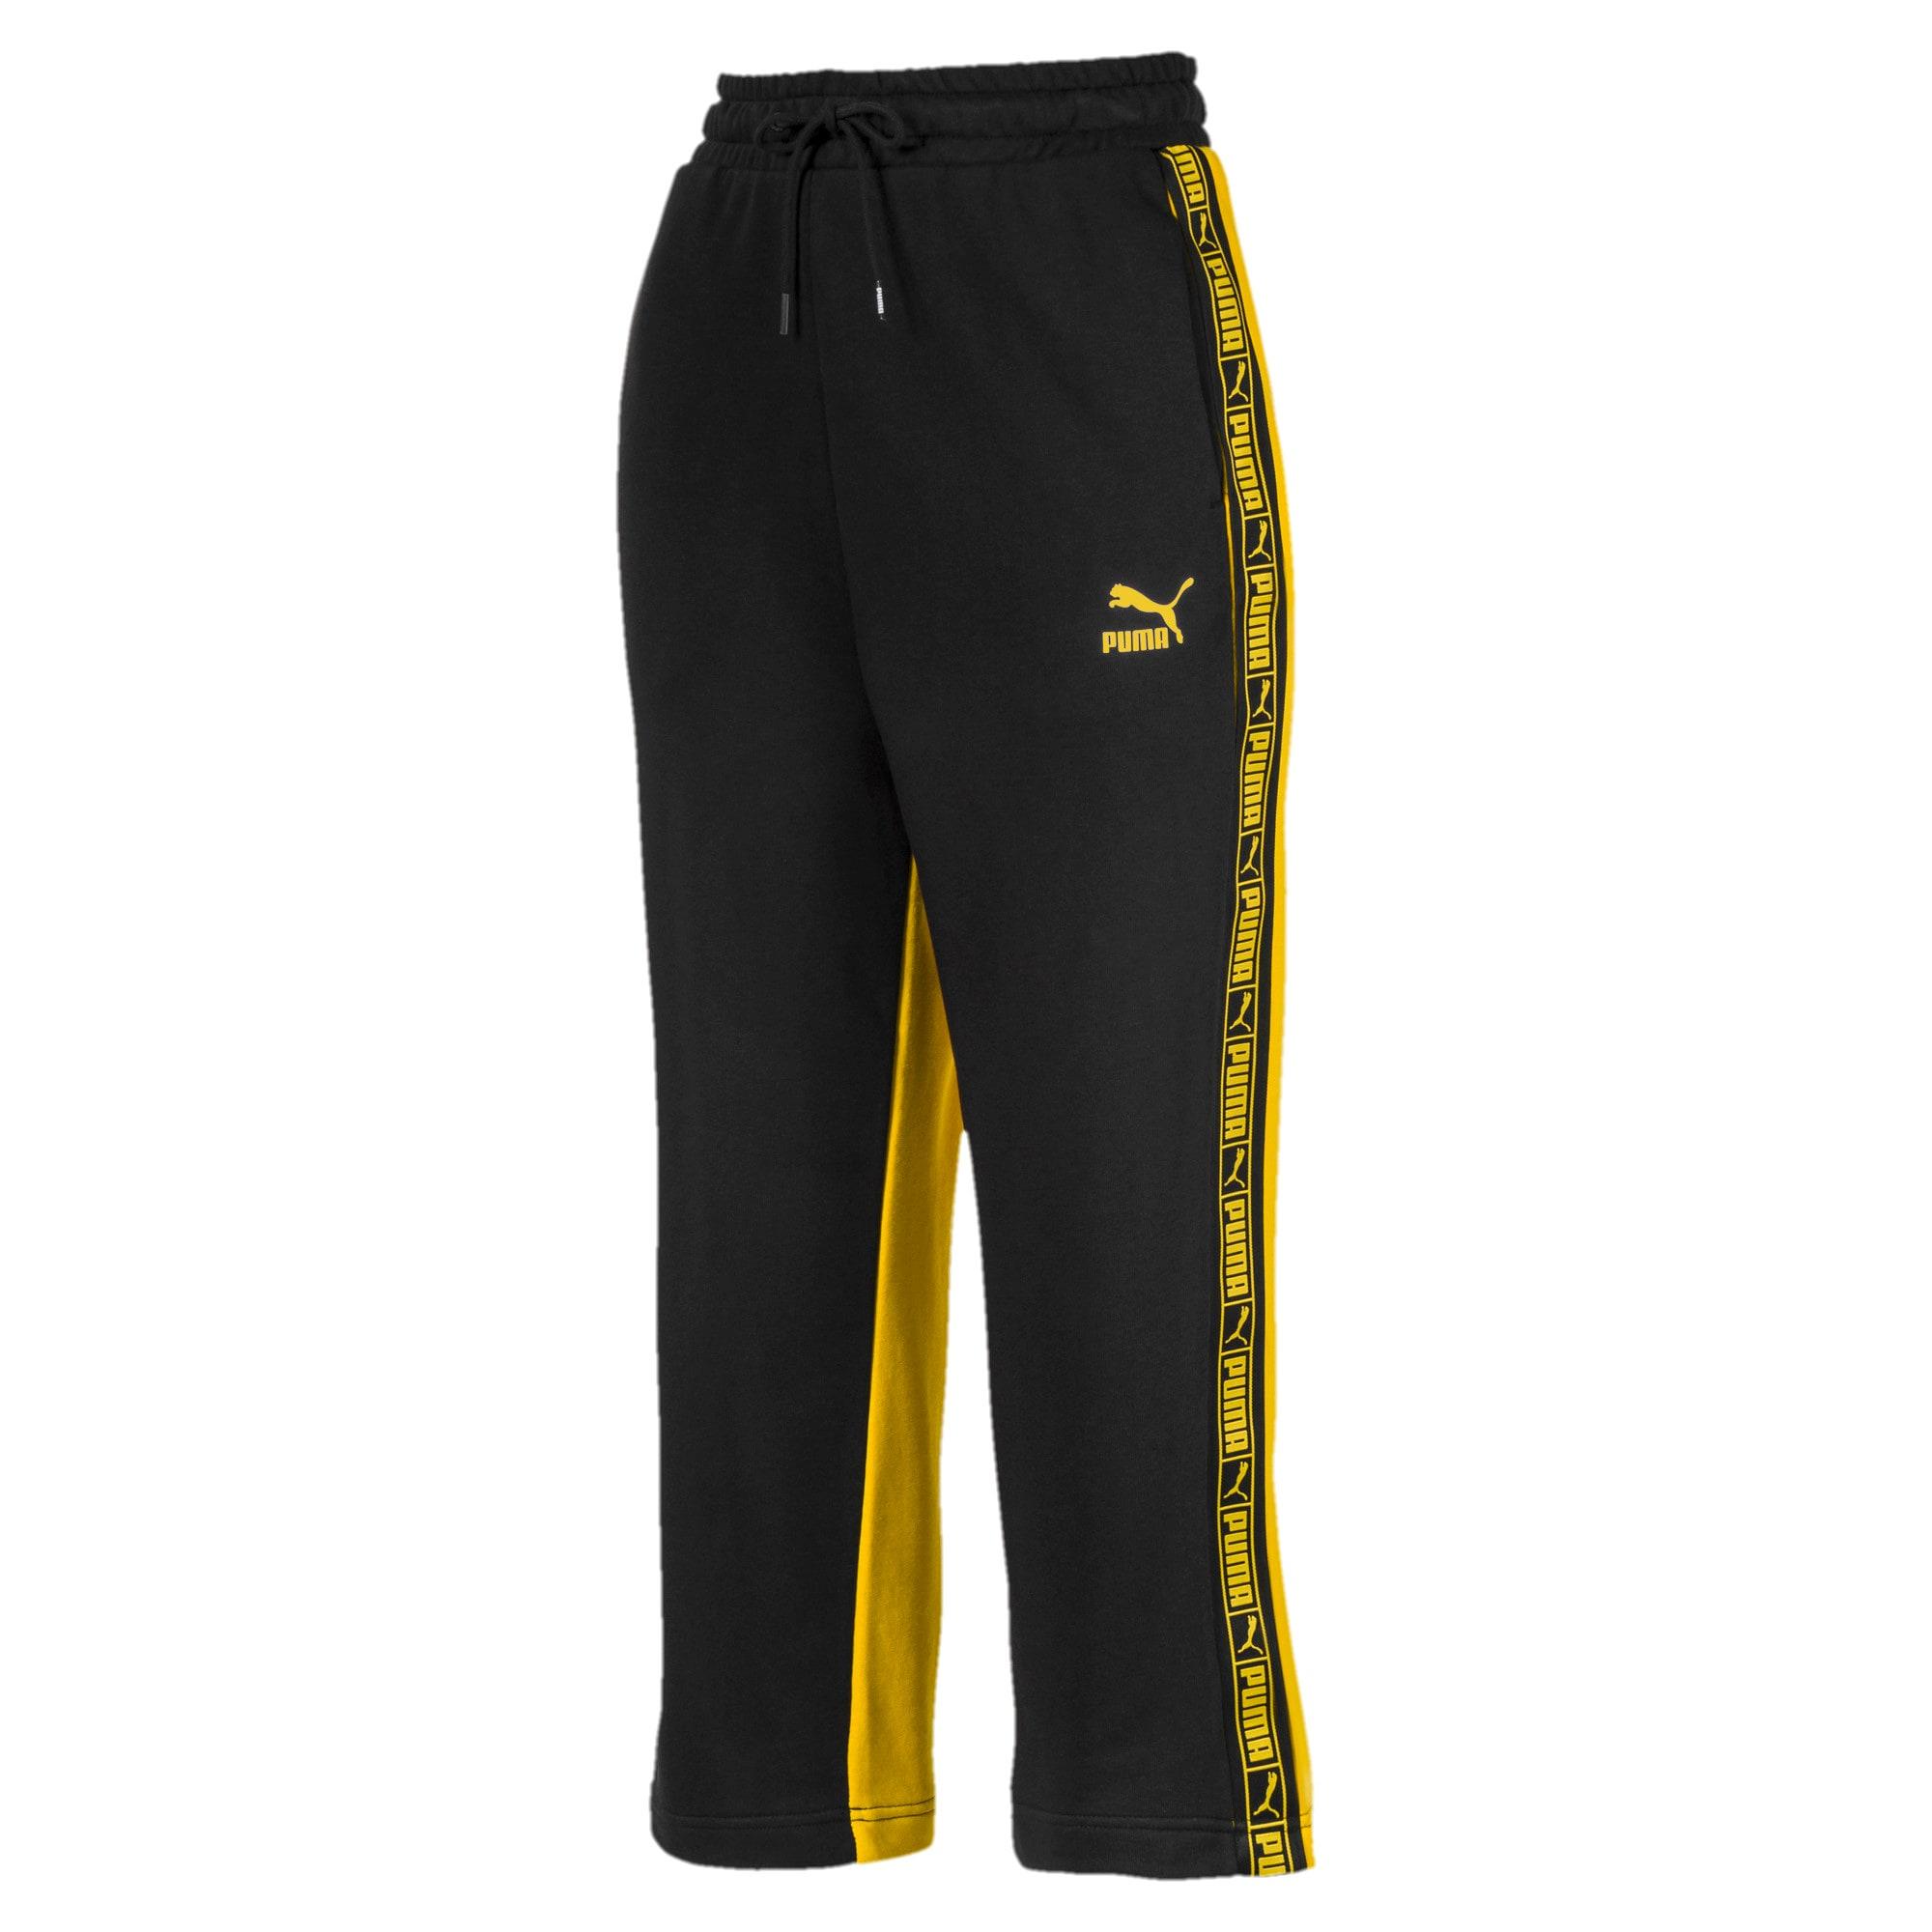 Thumbnail 1 of Classics Women's Track Pants, Sulphur, medium